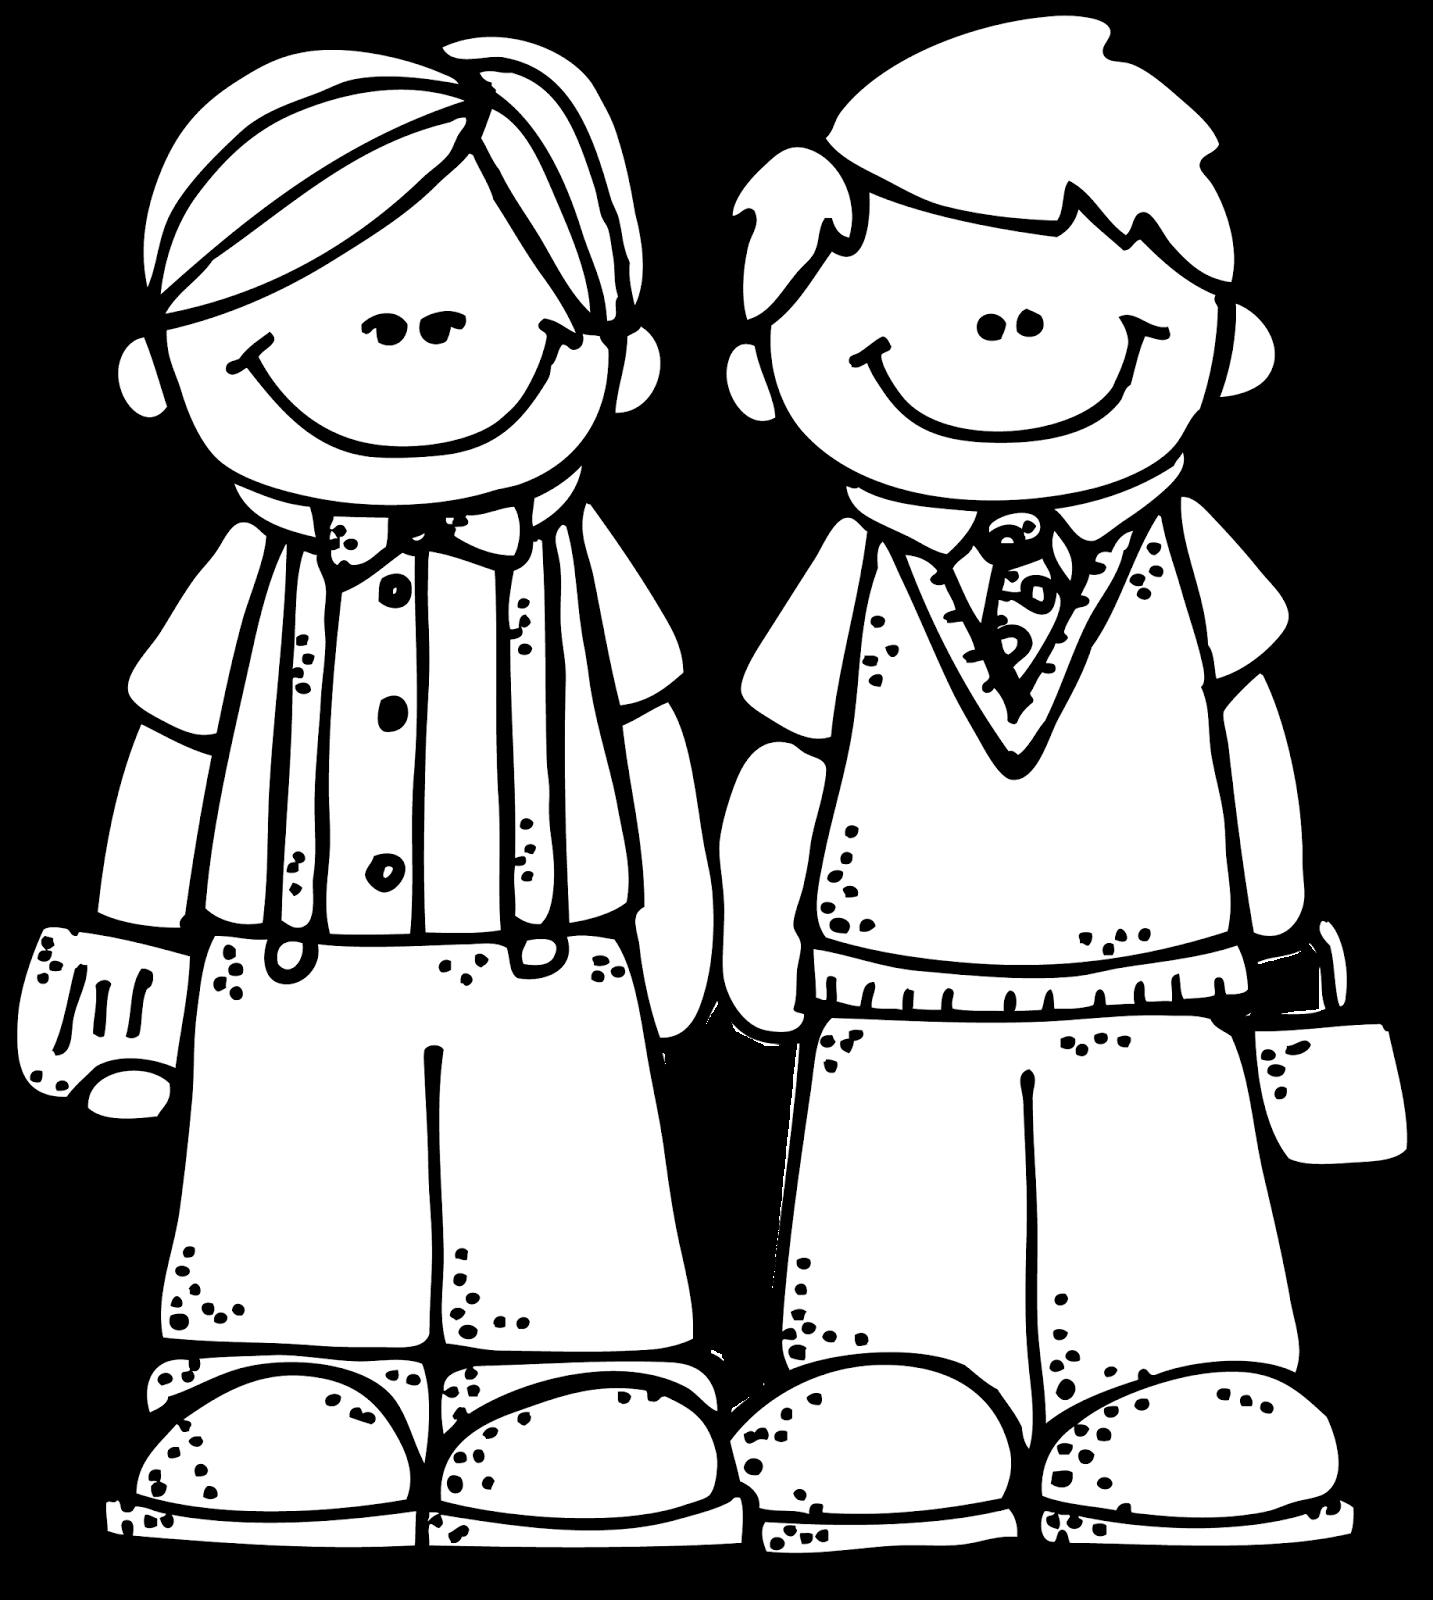 Friendship Clipart Black And White.